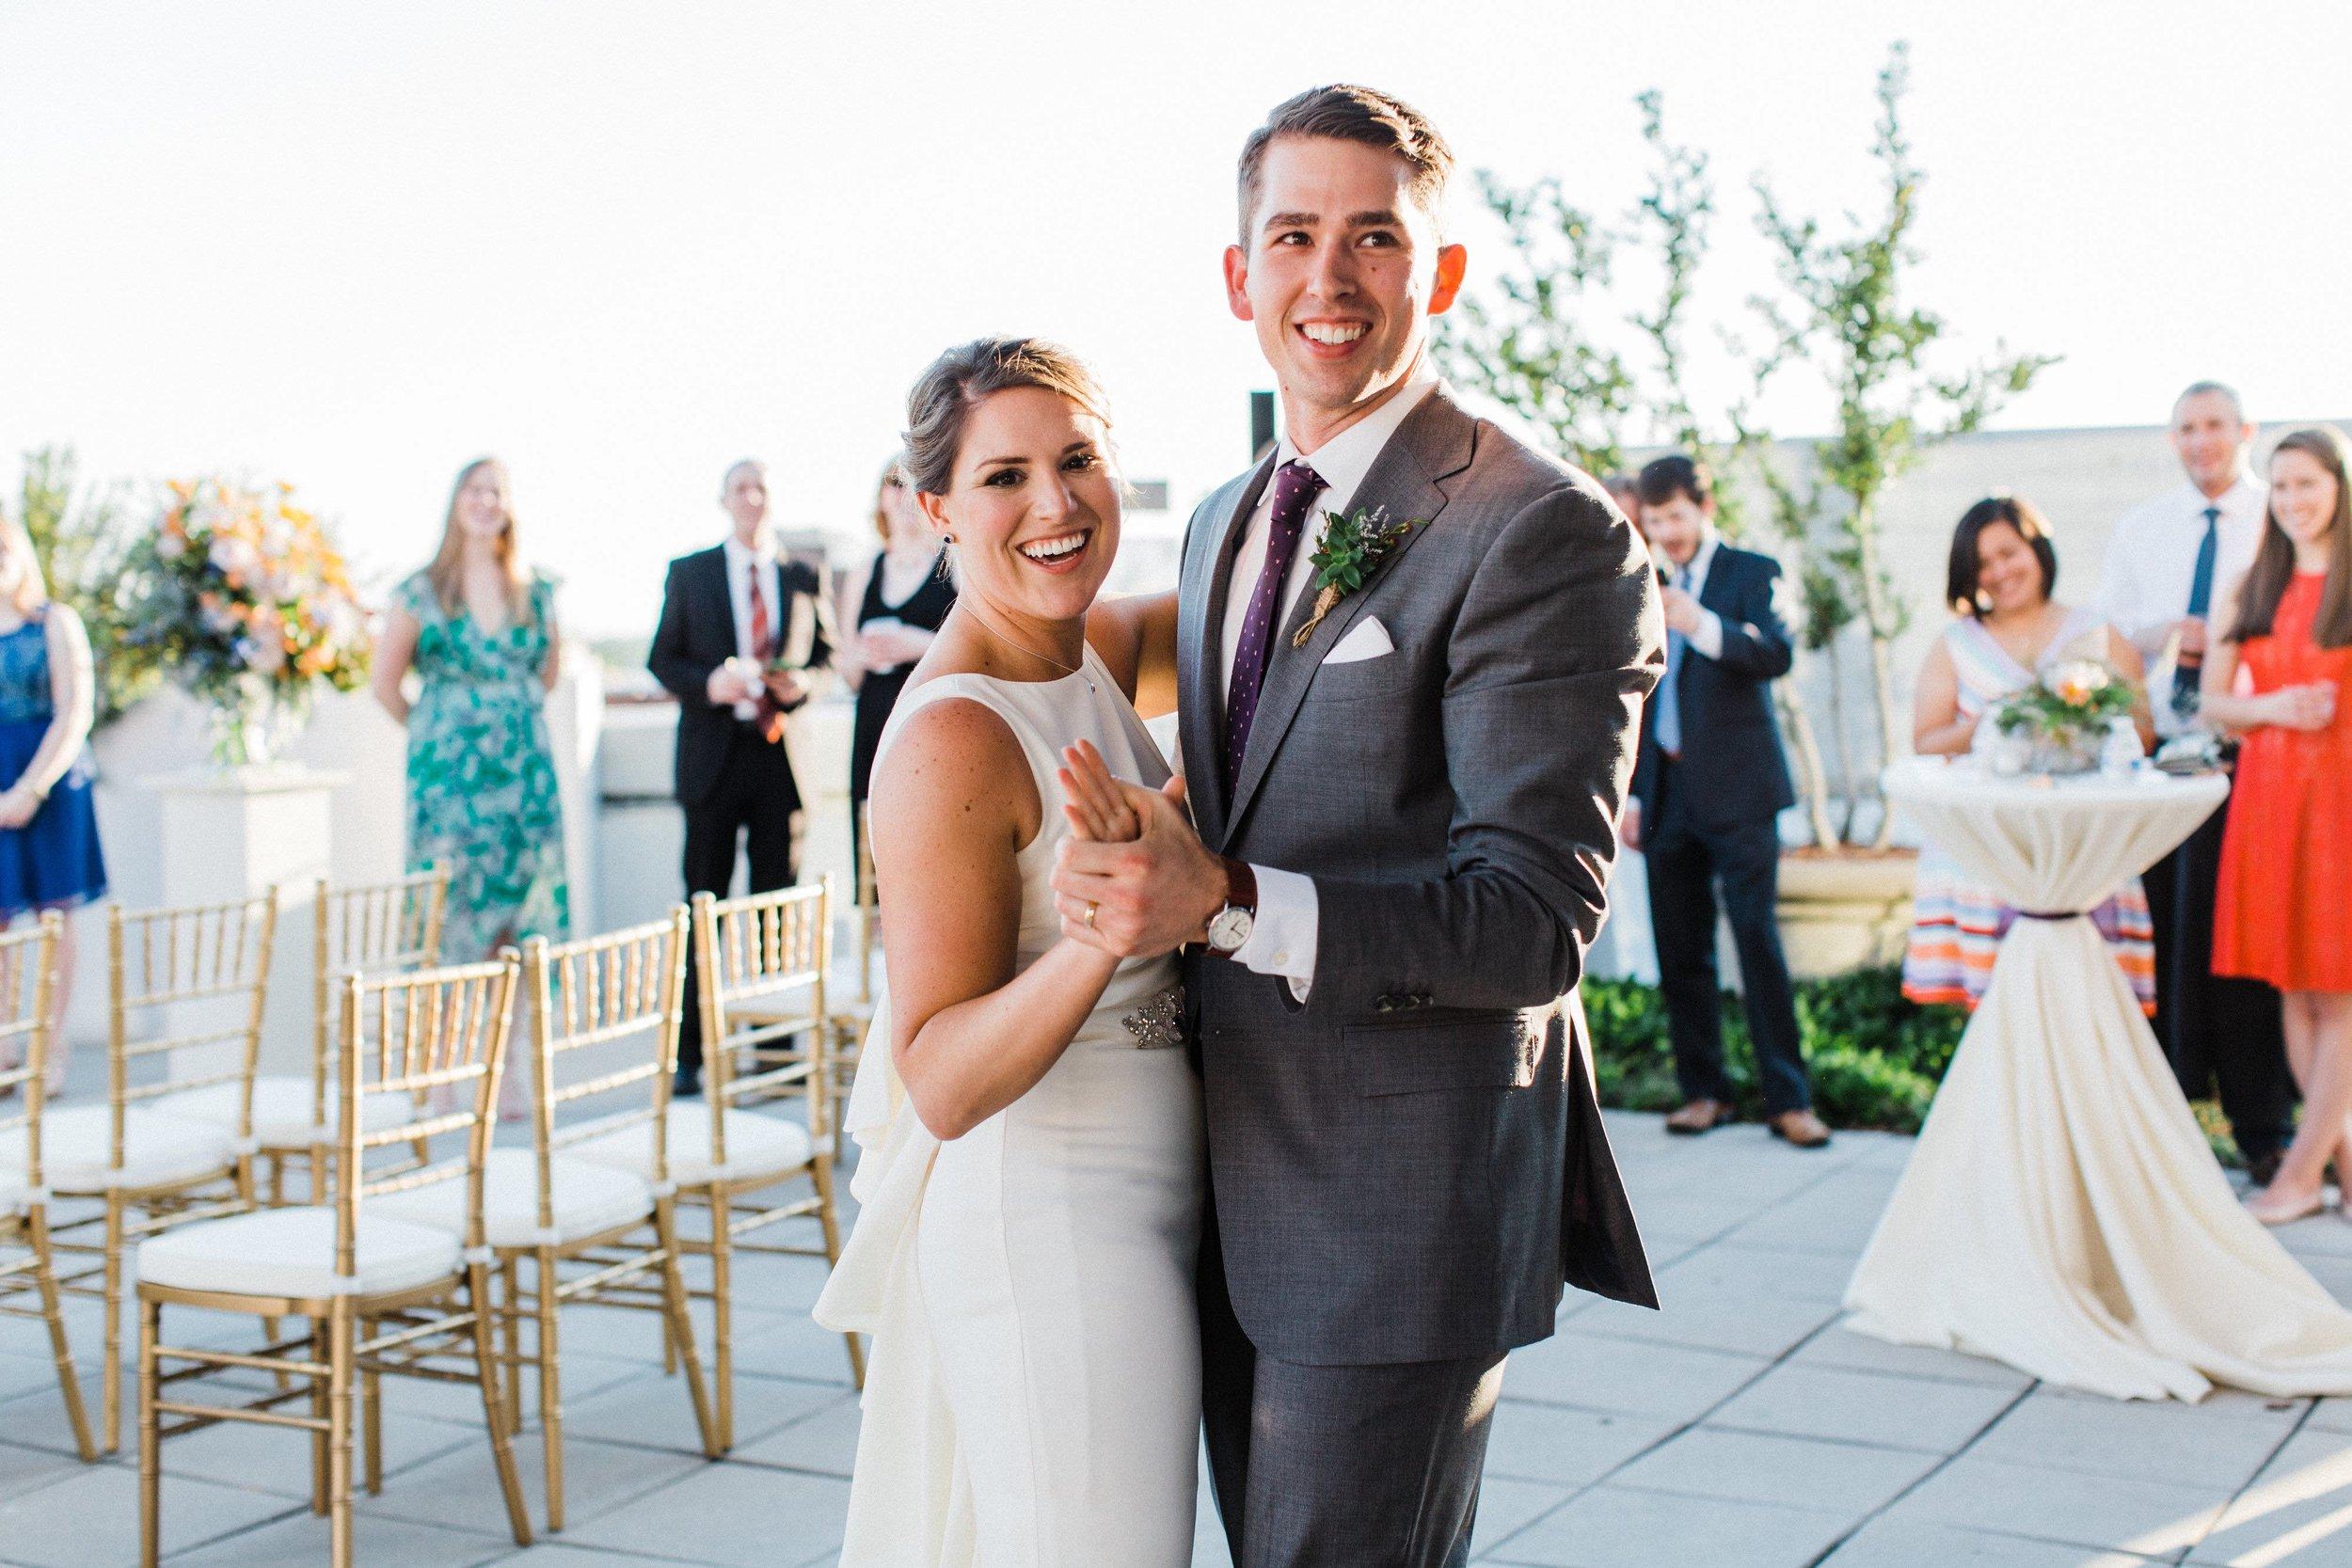 Stephen and Michelle-Reception-0041.jpg